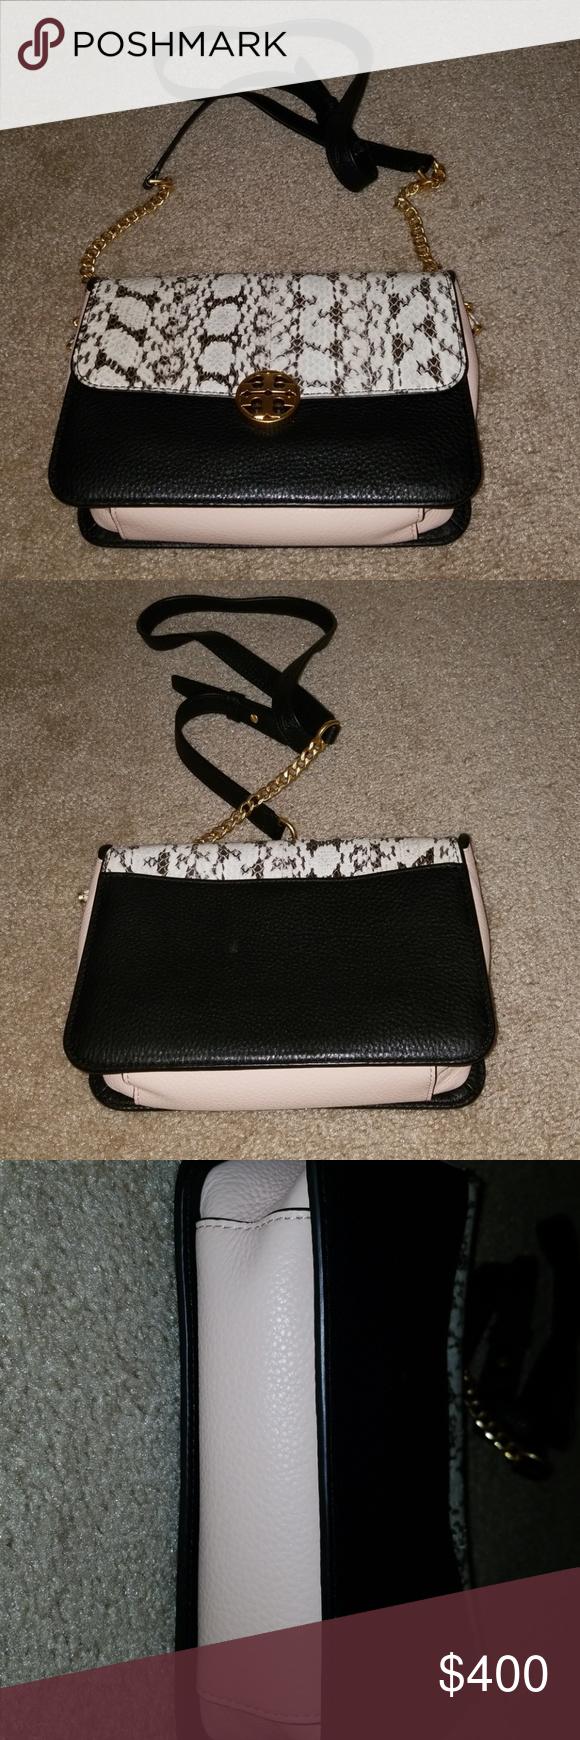 2b5a1ed3de Tory Burch NWT Chelsea snake bag Colorblock crossbody in snakeskin Tory  Burch Bags Crossbody Bags